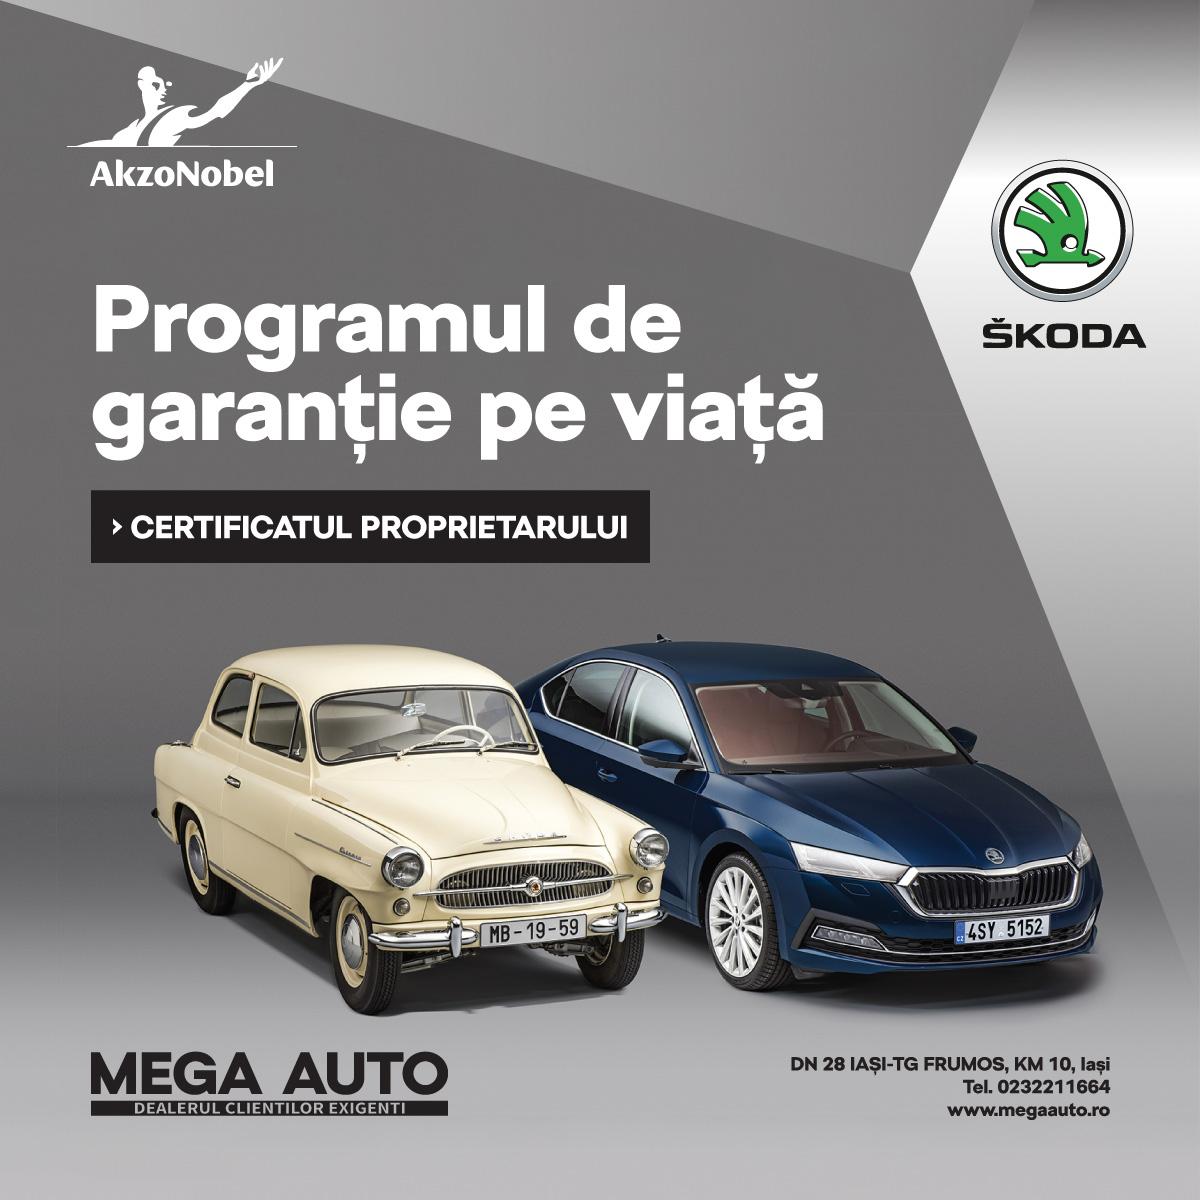 La Mega Auto – ŠKODA Iași ai parte de garanție pe viață la vopsitoria auto